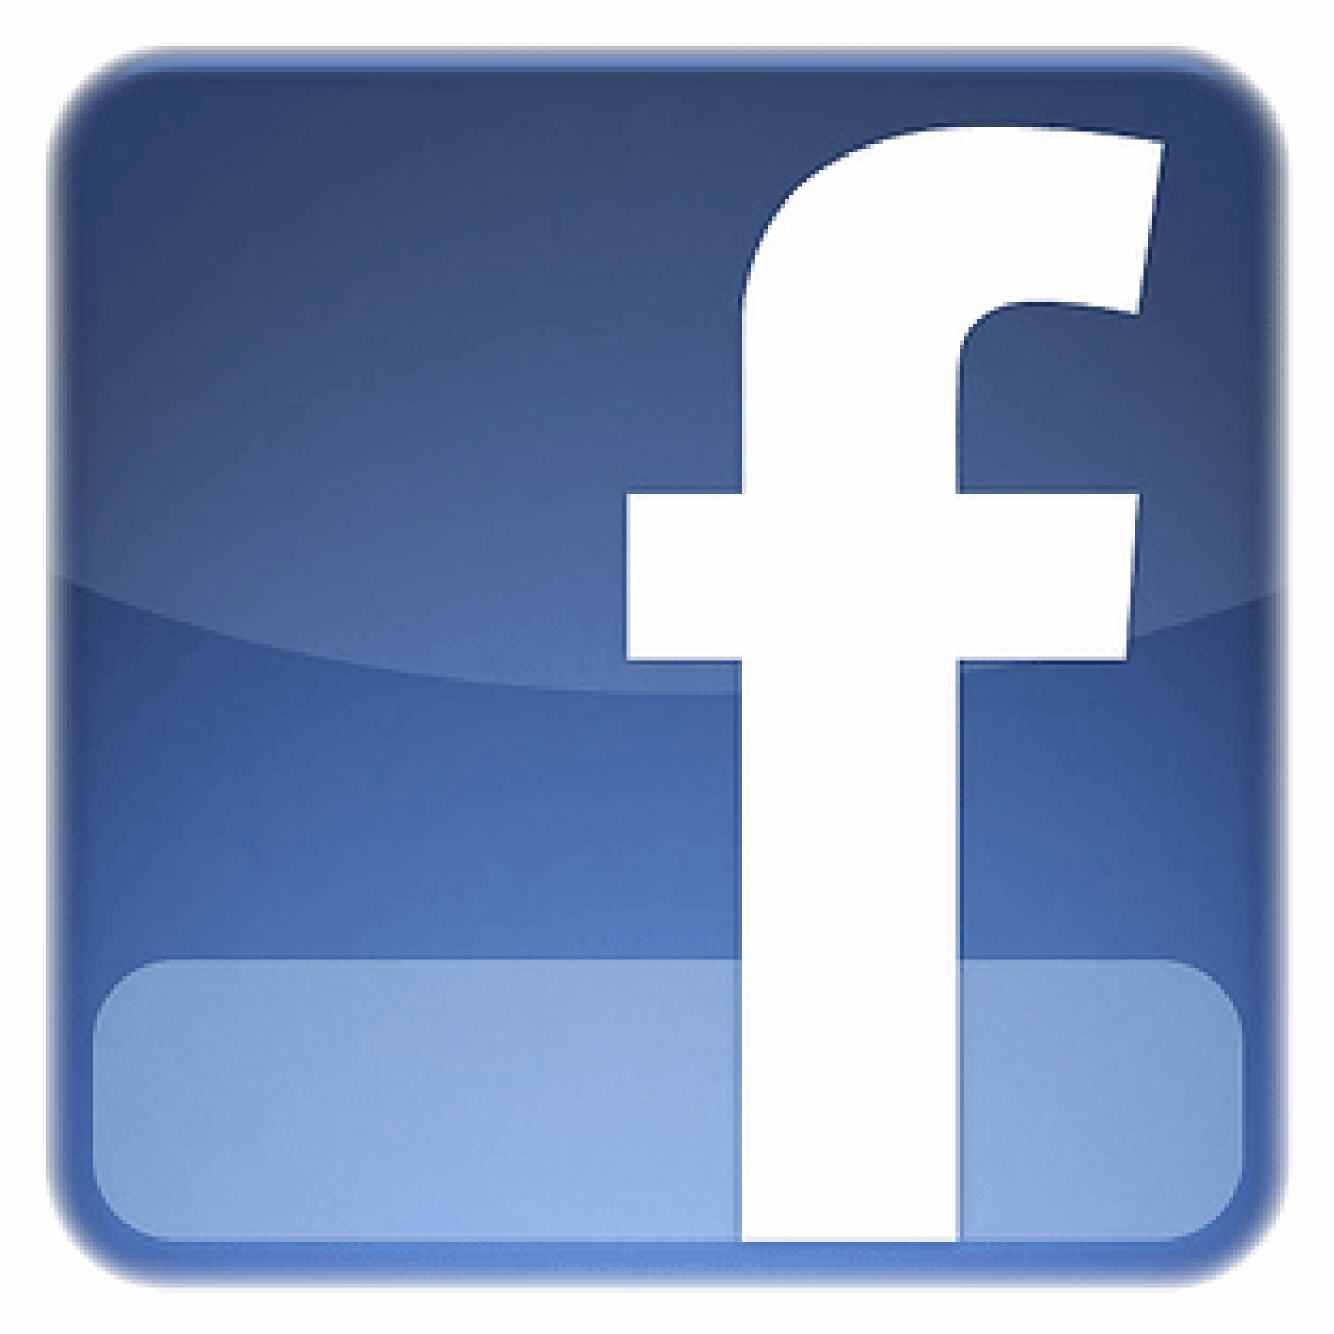 Facebook Logo Yoga Alliance